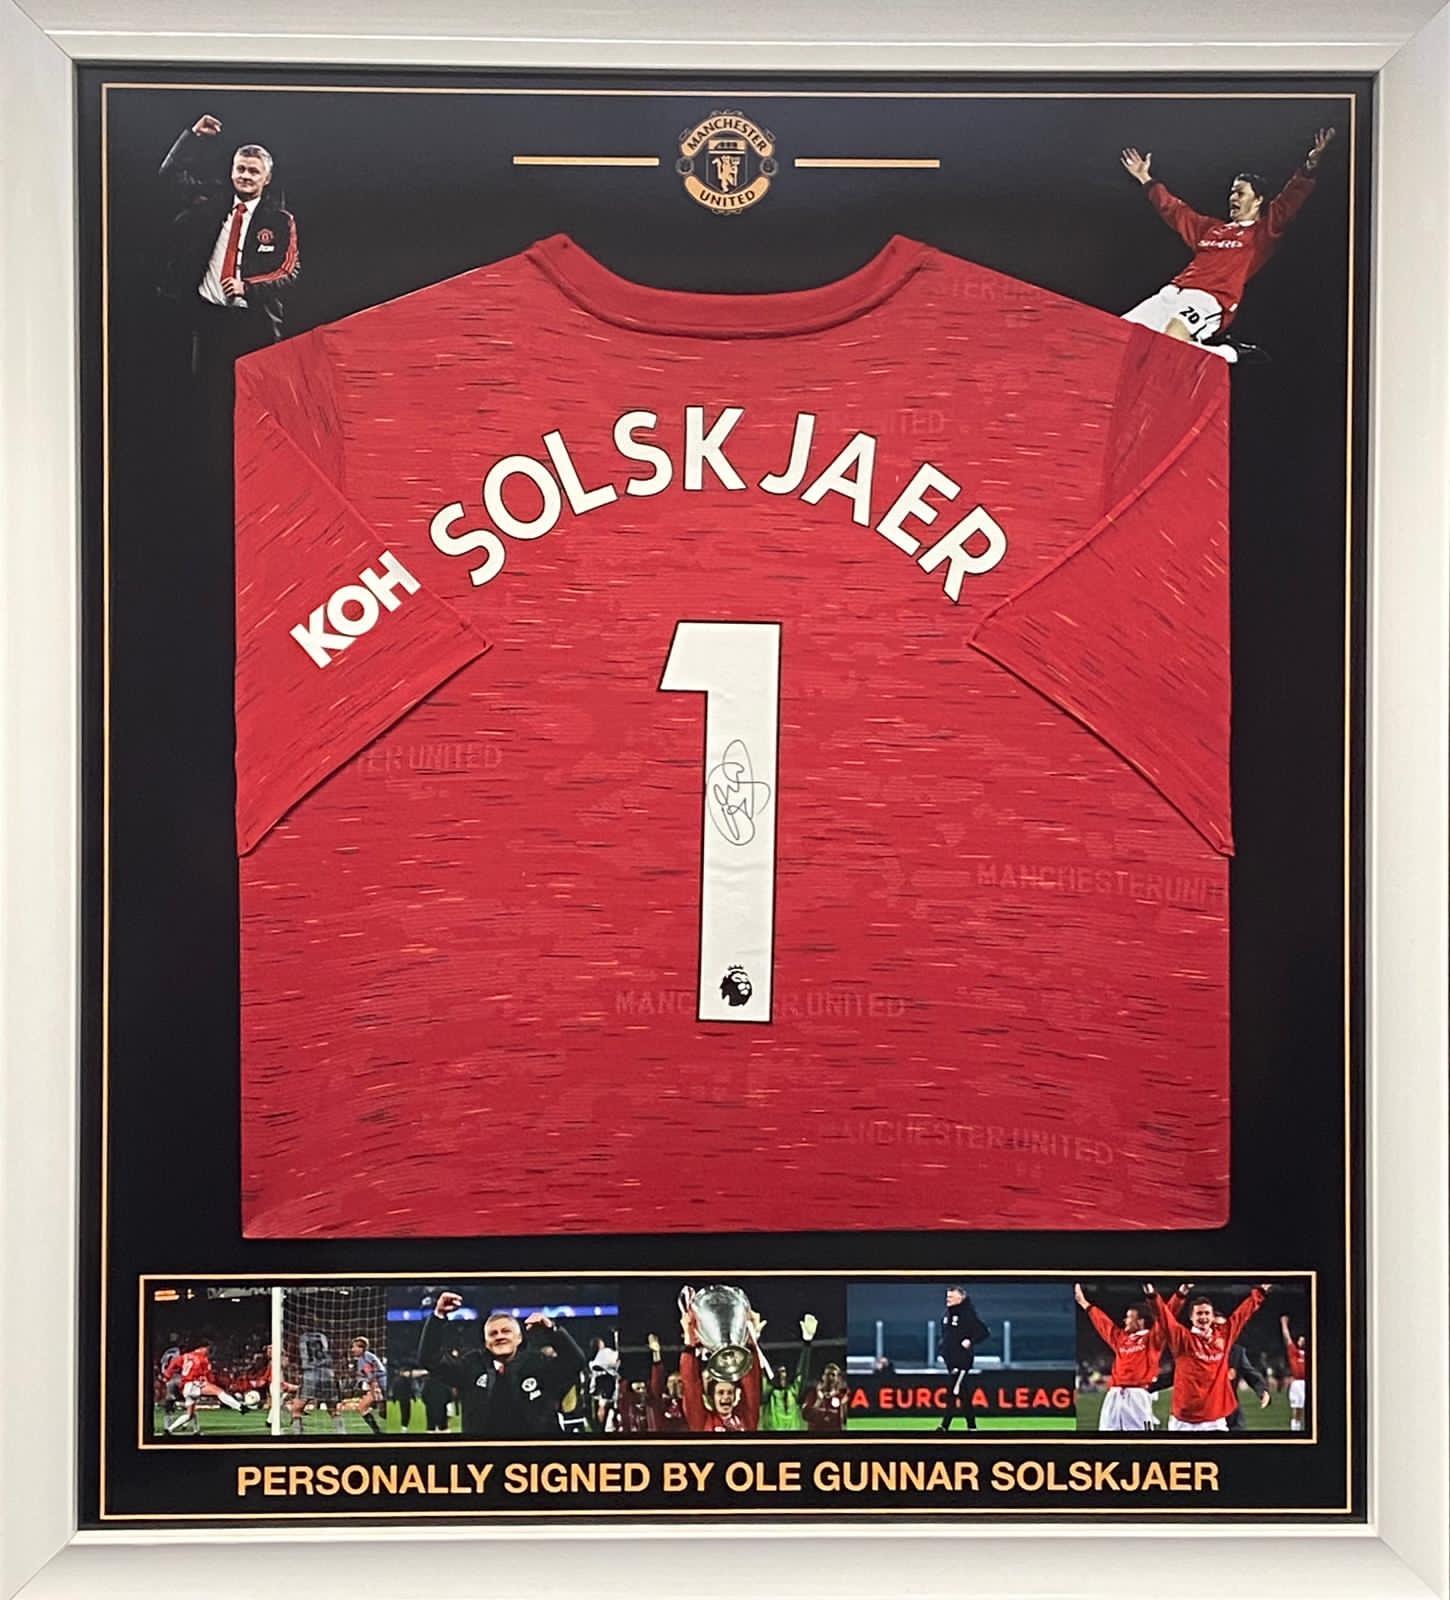 Man Utd Framed Shirt Montage of Celebrations Of Management & champions league final 1999 Signed by ole Gunnar solskjaer